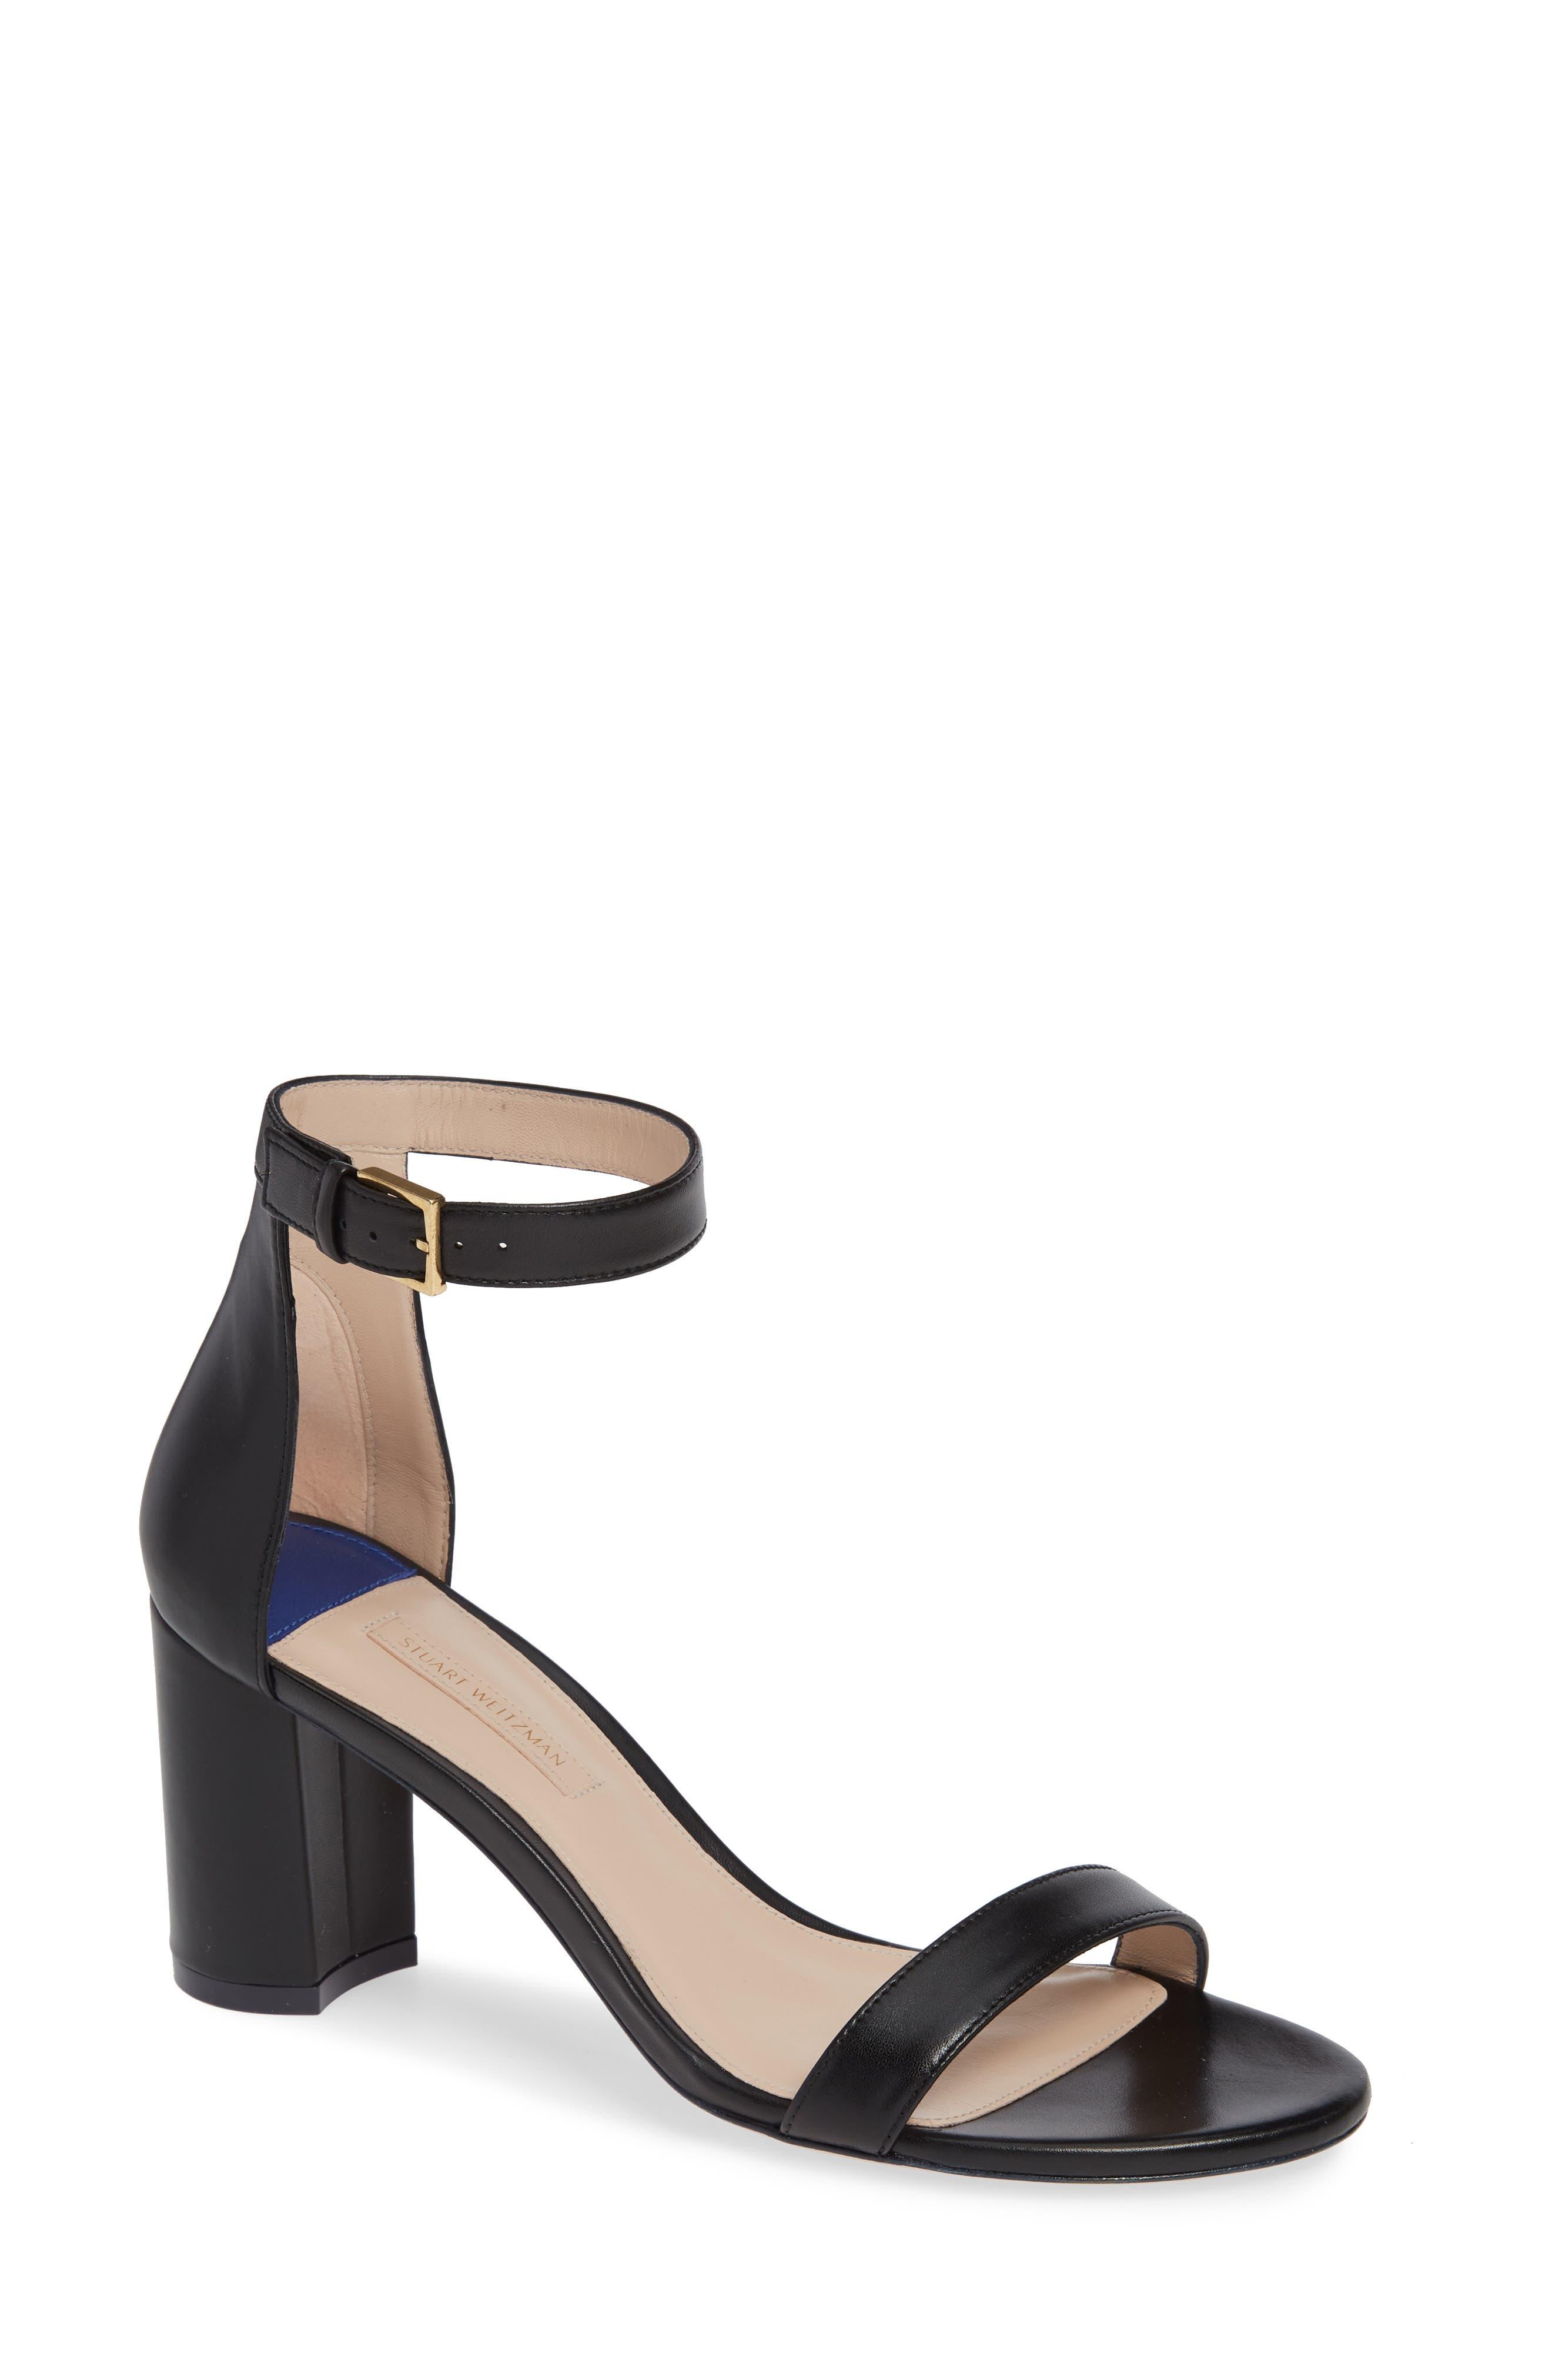 75LESSNUDIST Ankle Strap Sandal,                         Main,                         color, BLACK NAPPA